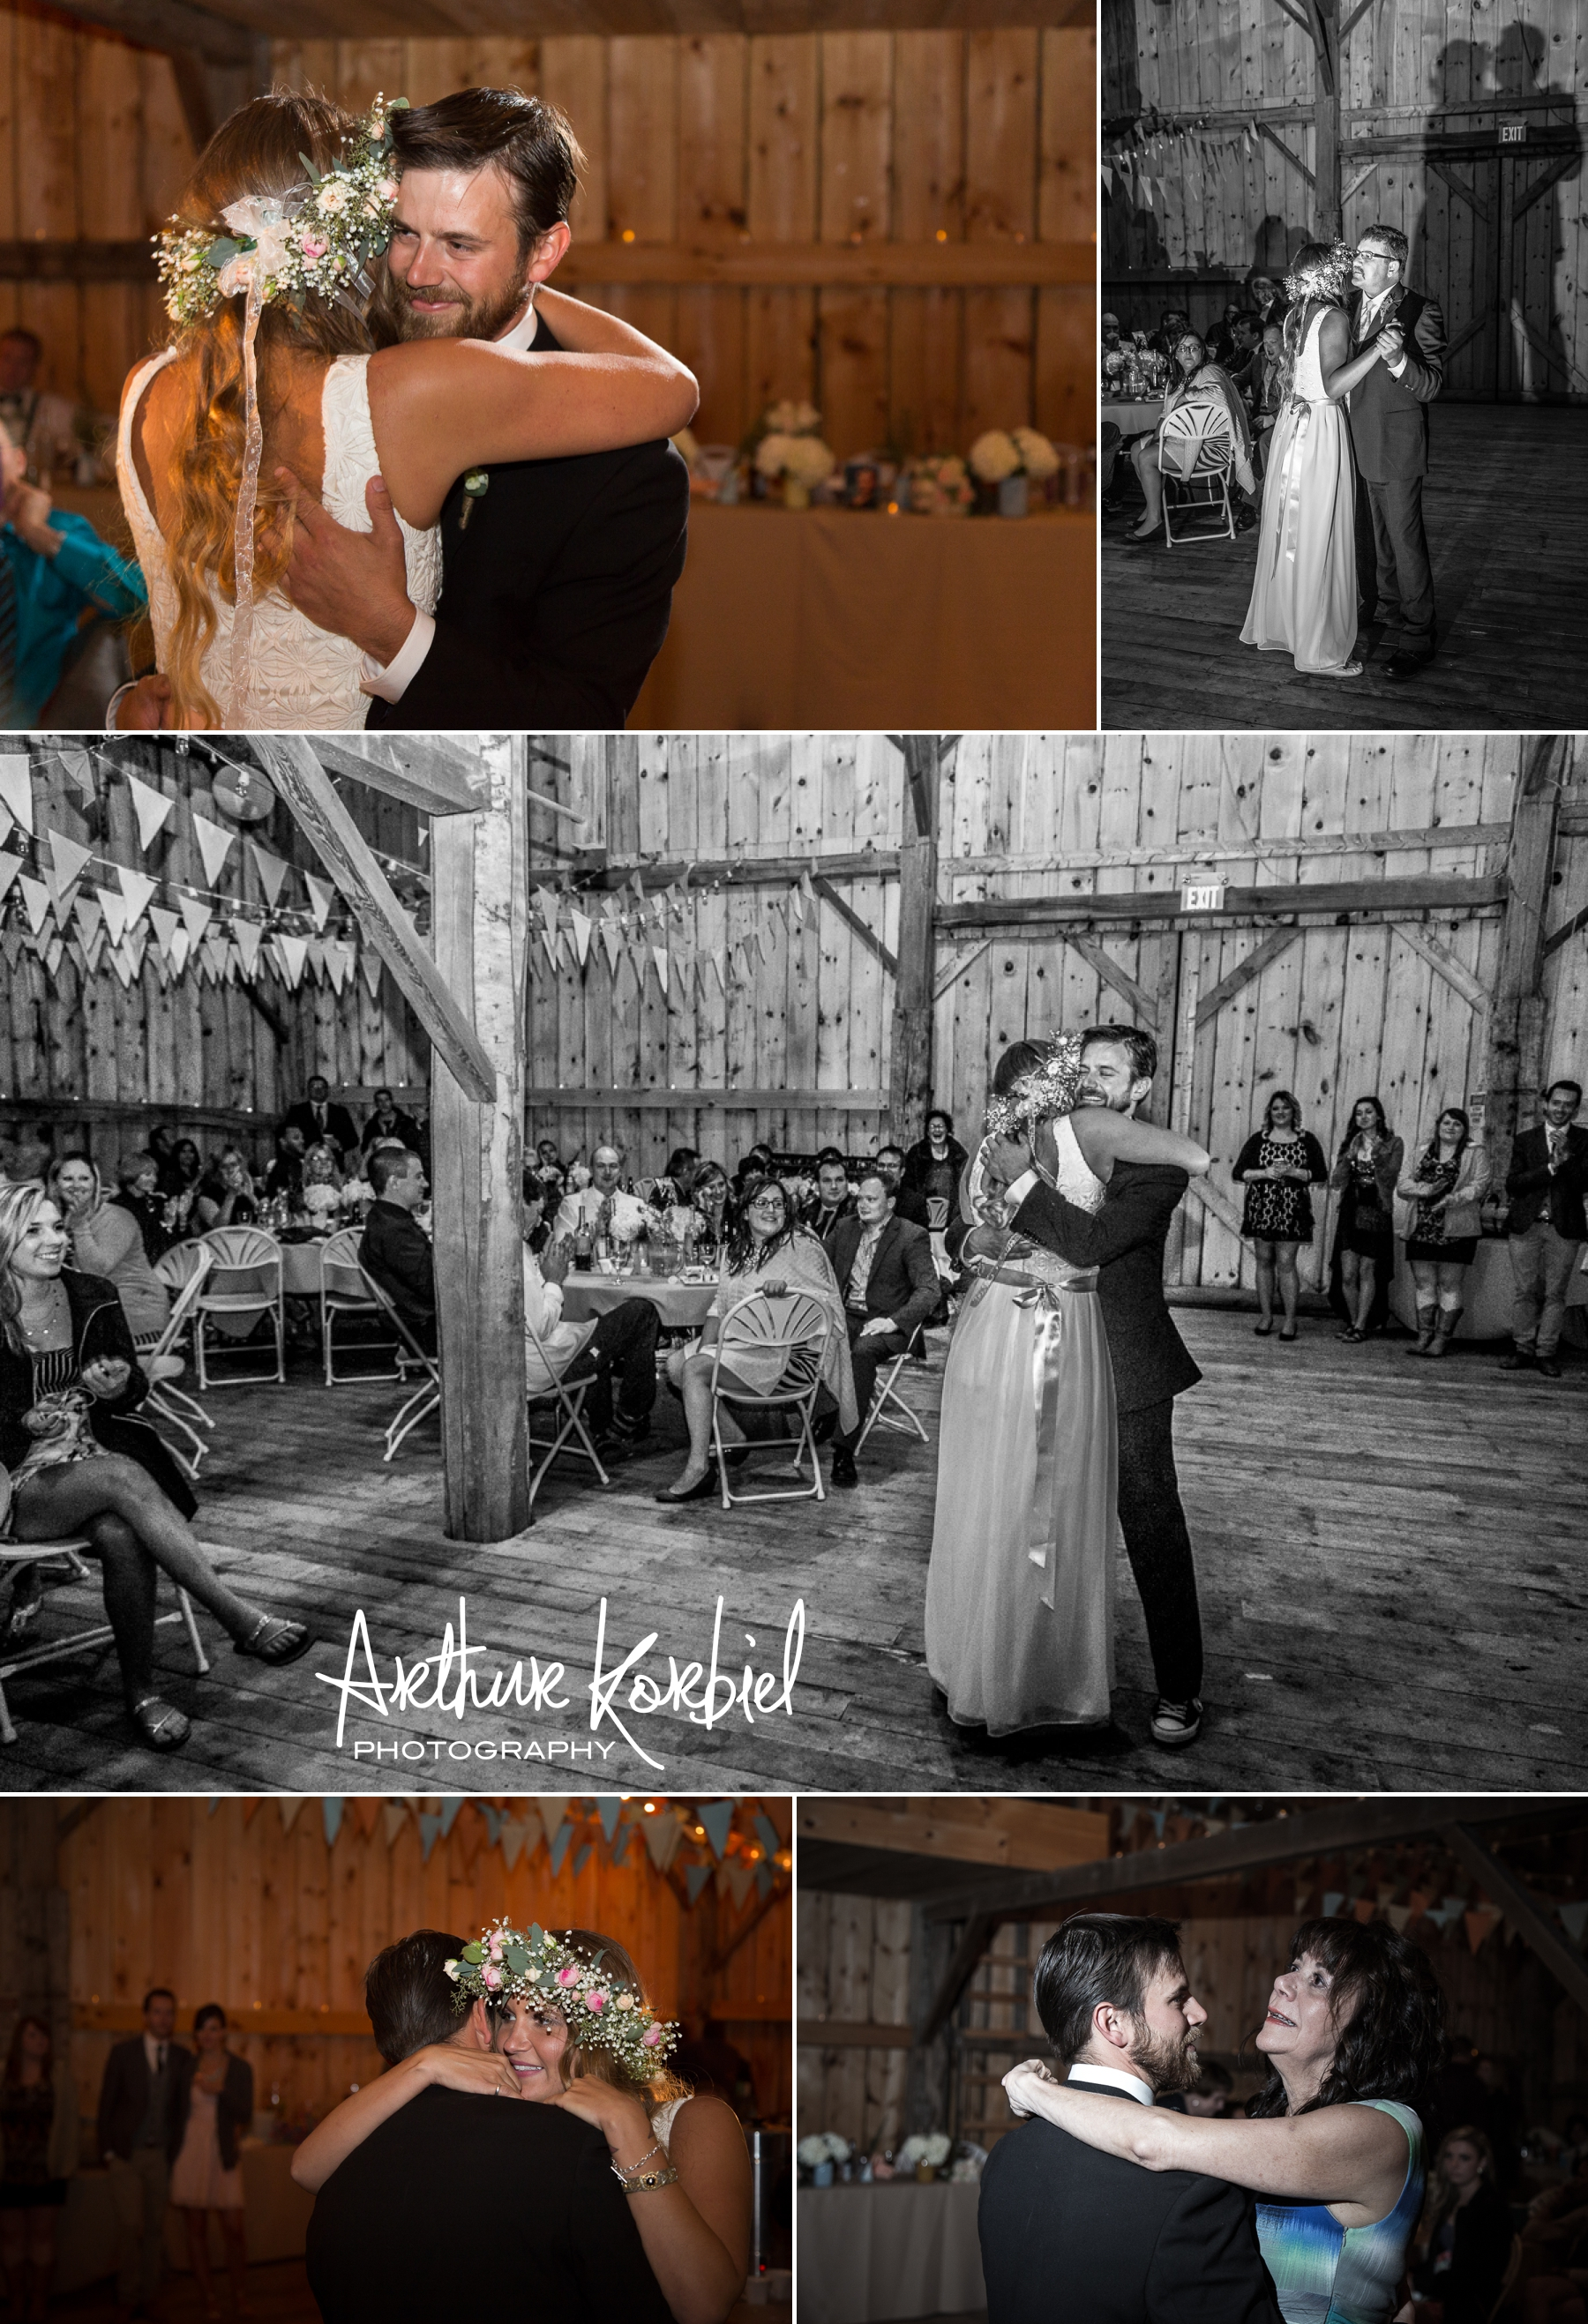 Arthur Korbiel Photography - London Engagement Photographer - Sauble Beach Barn Wedding - Samantha & Dan_014.jpg